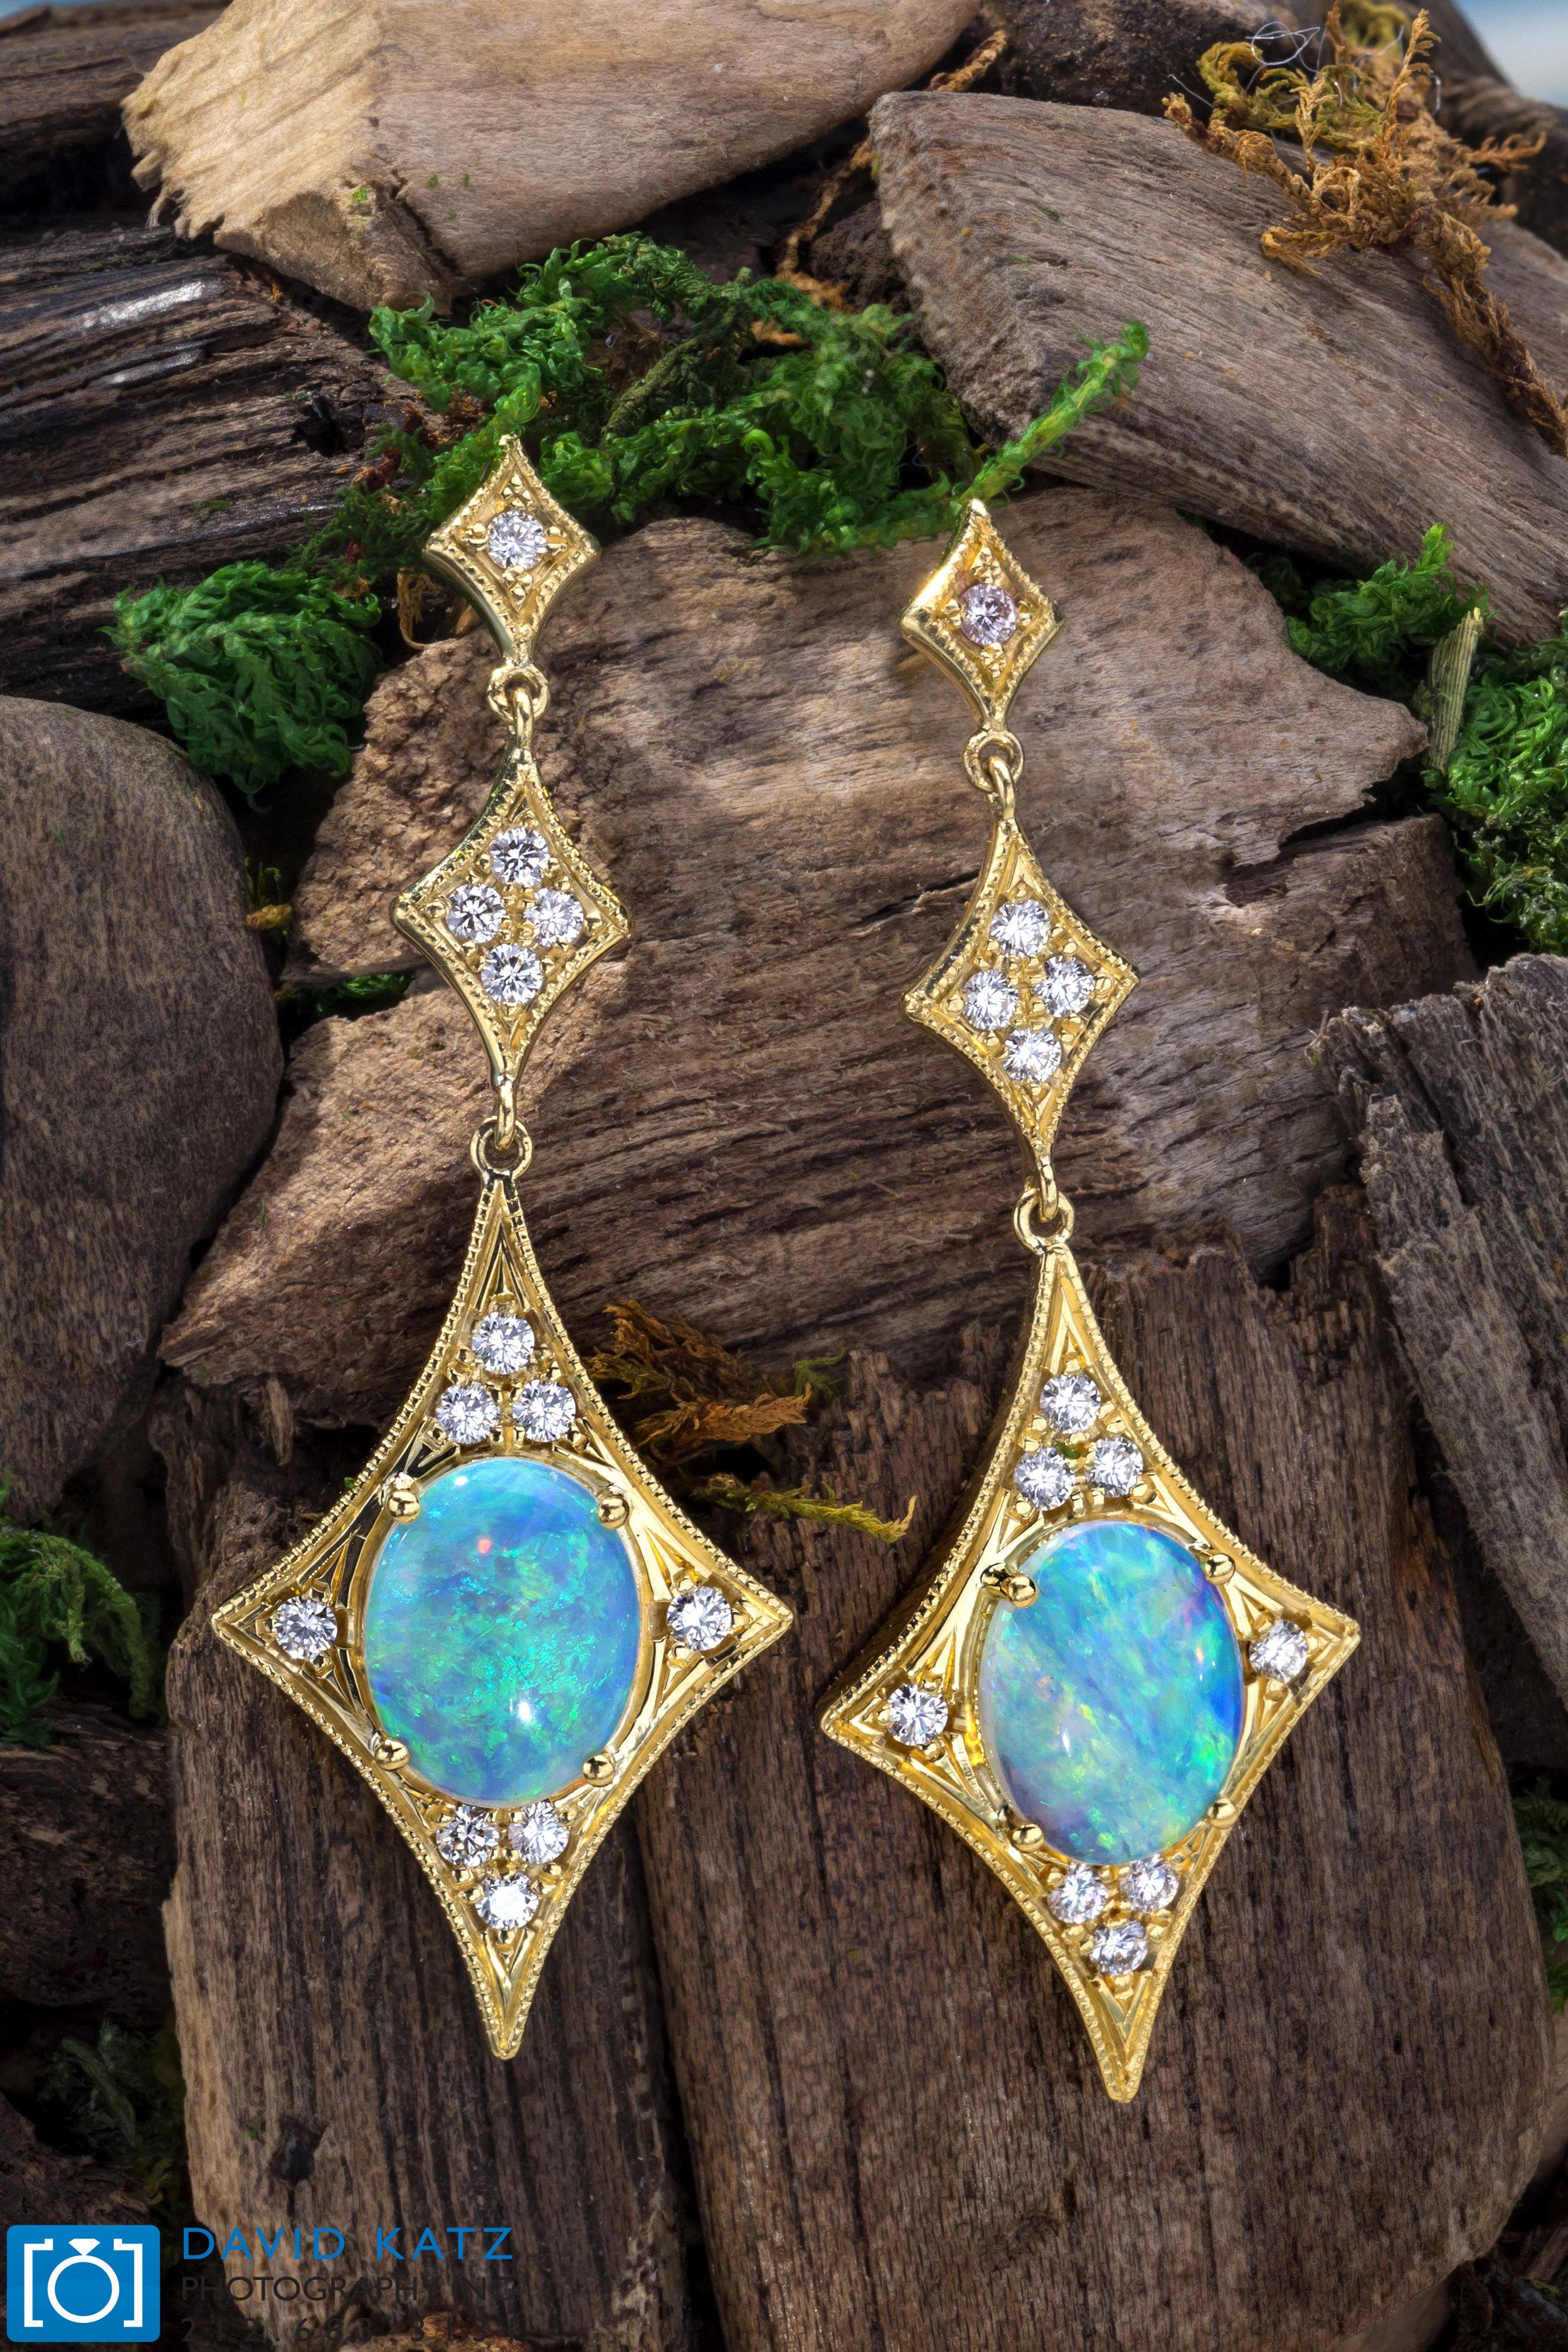 Opal Earrings on Wood Ball_NEWLOGO.jpg